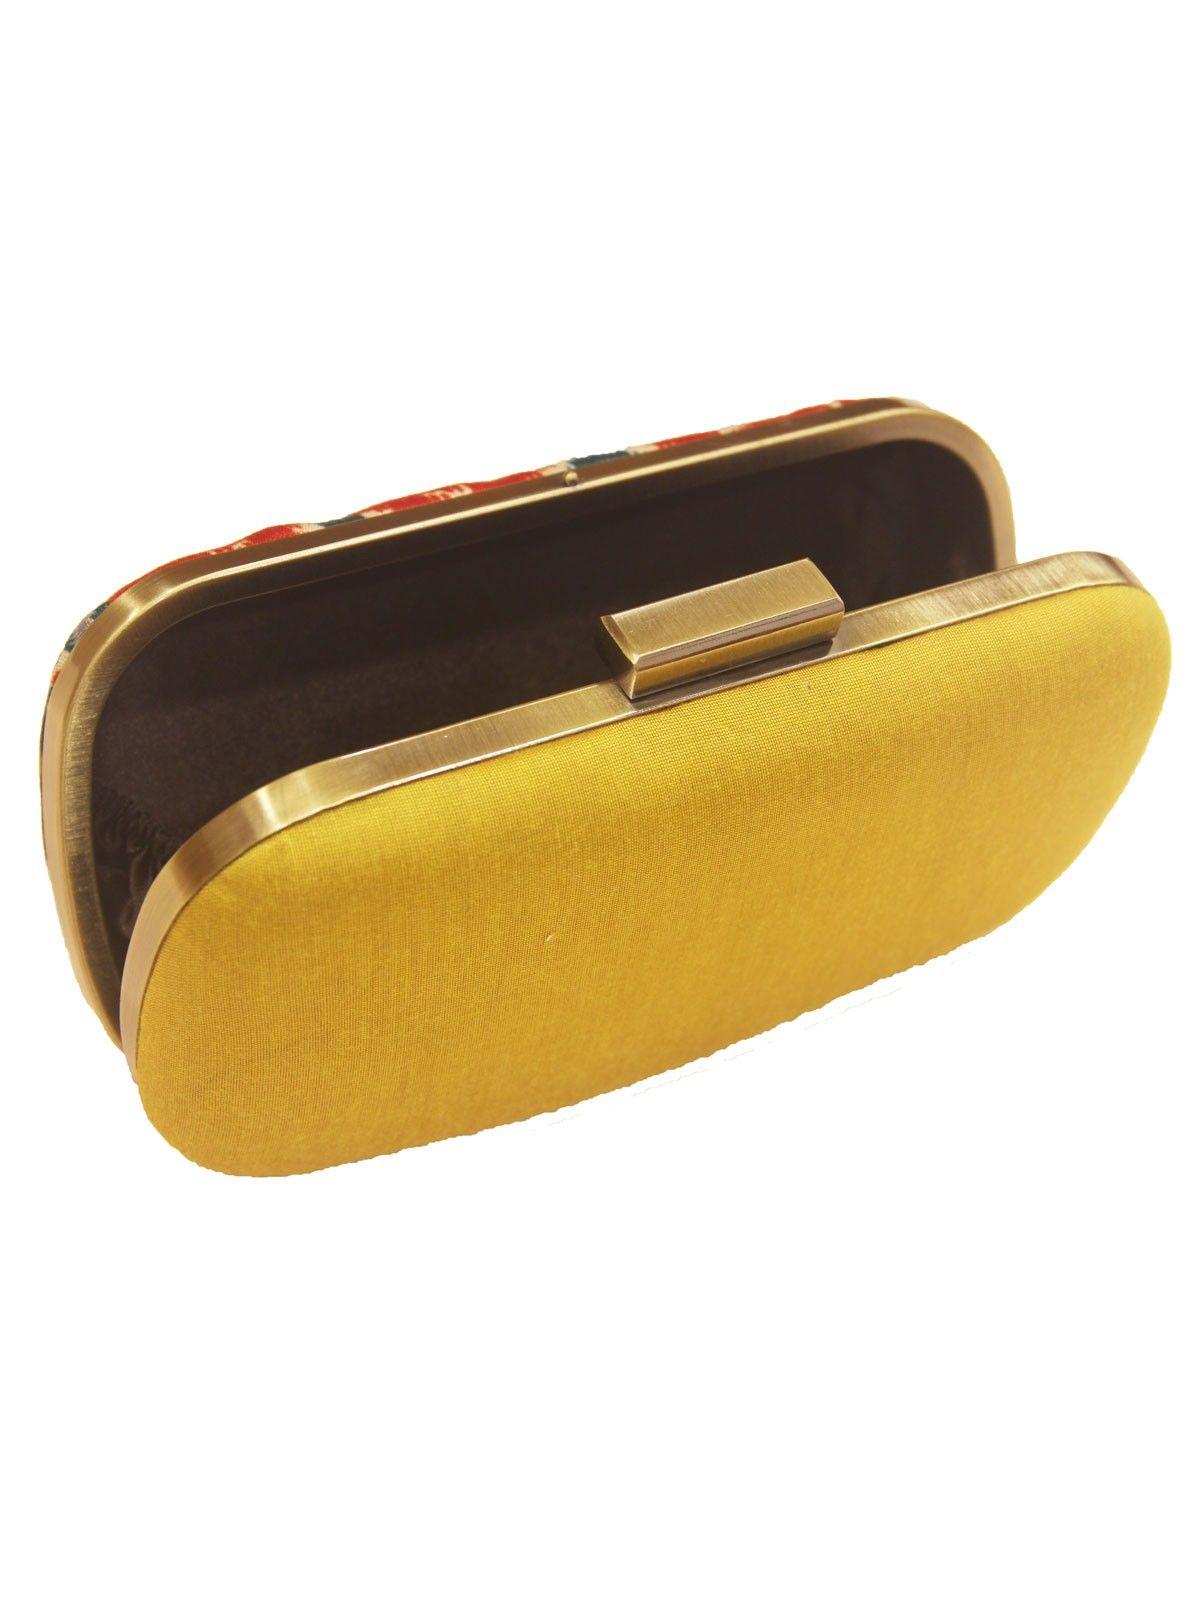 Mustard handloom Ikat metal frame women,s clutch